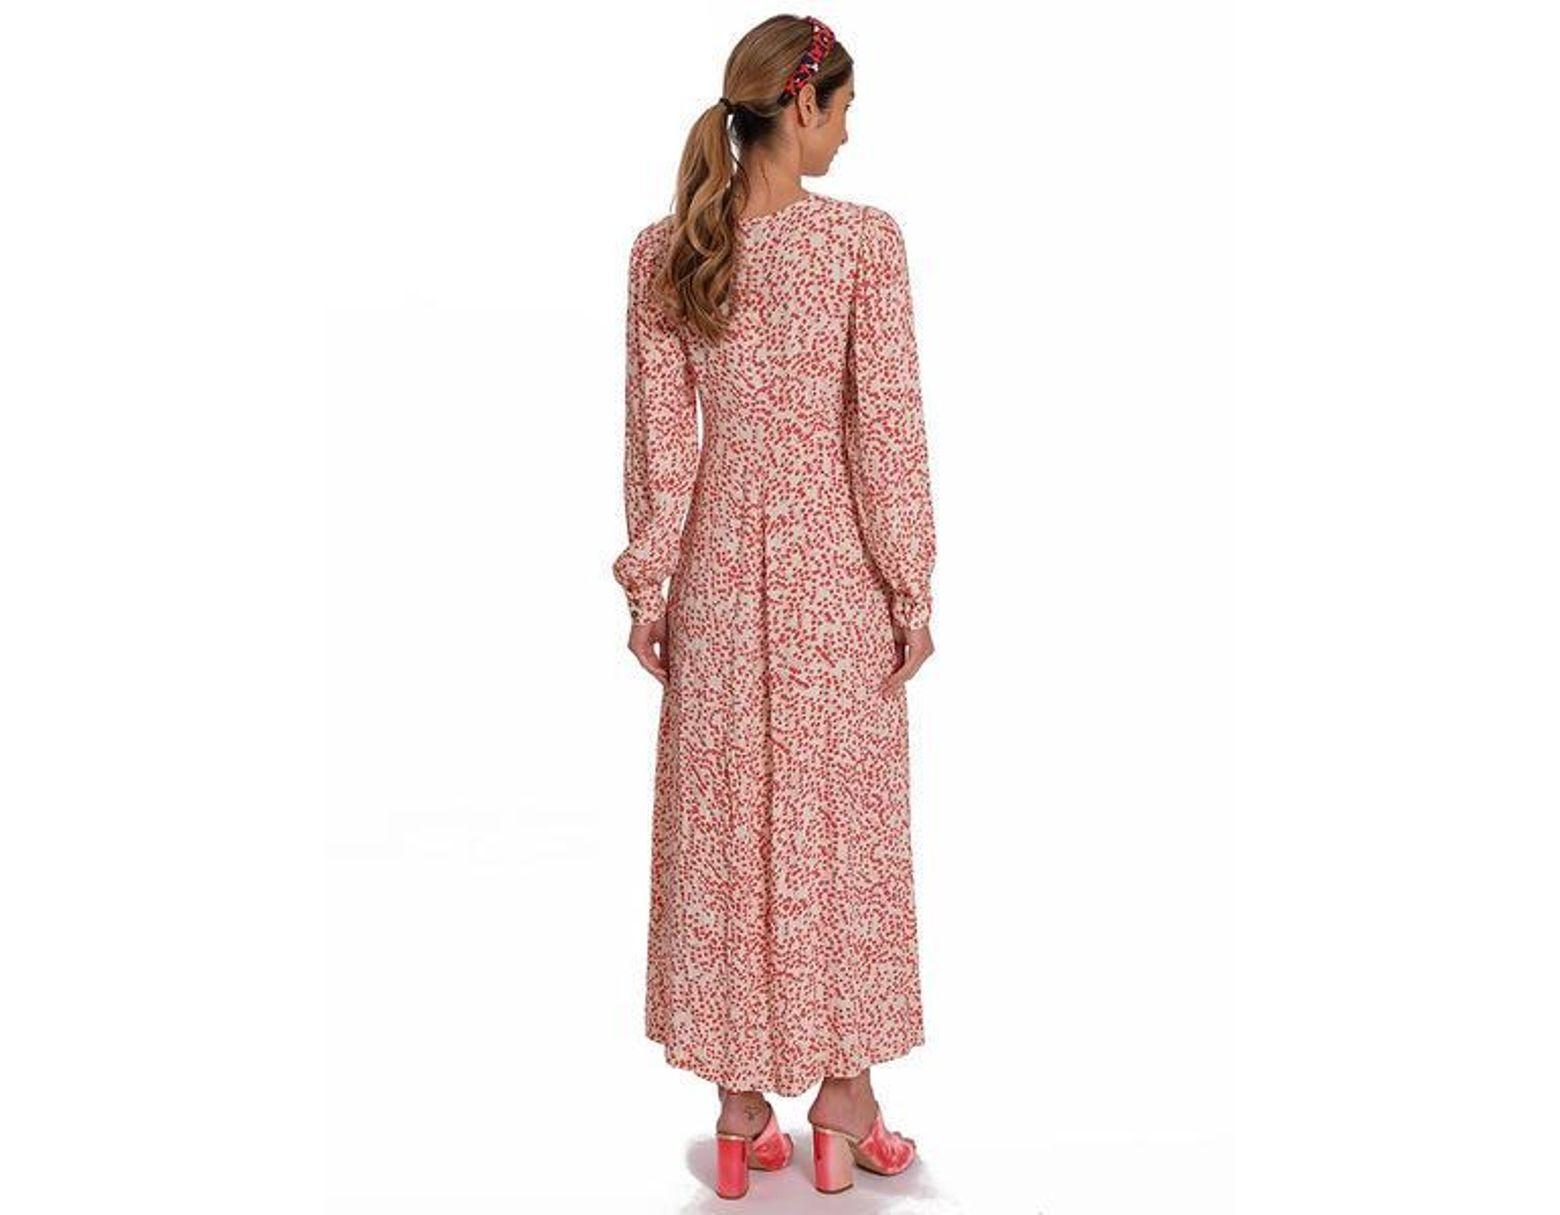 b06a6d03 Ganni Crepe Floral Maxi Dress in Pink - Lyst